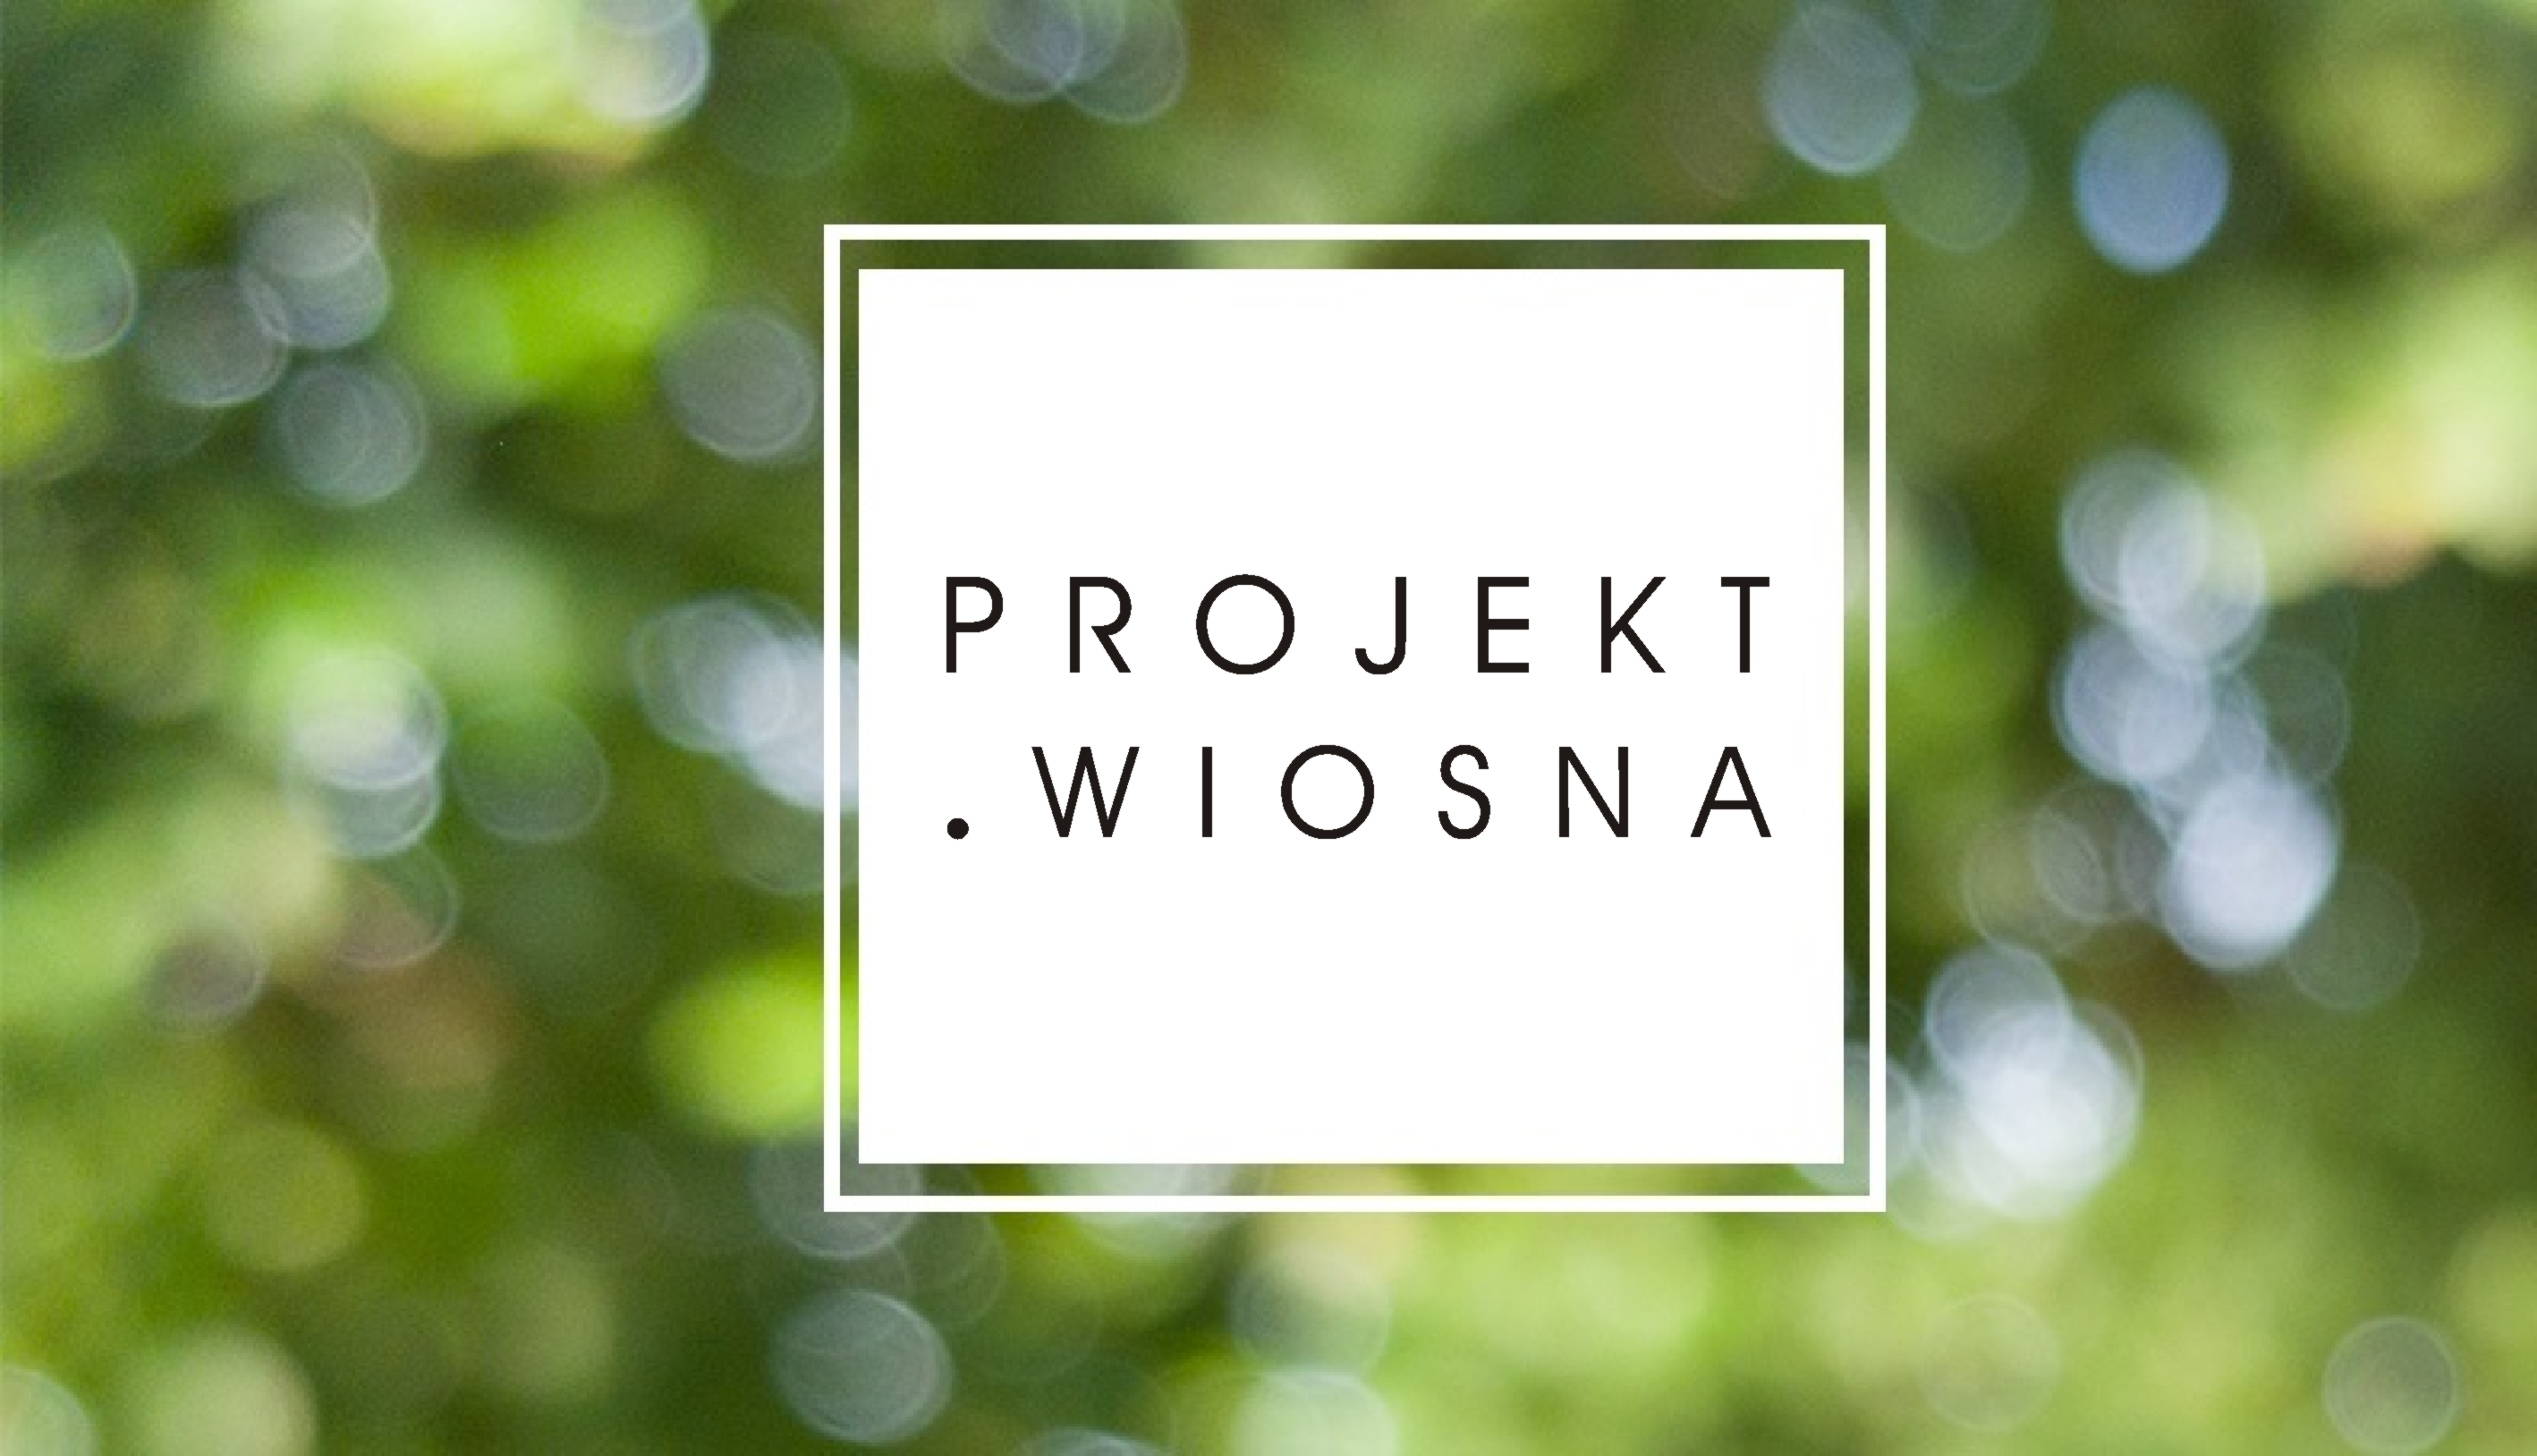 PROJEKT WIOSNA K lightbox www